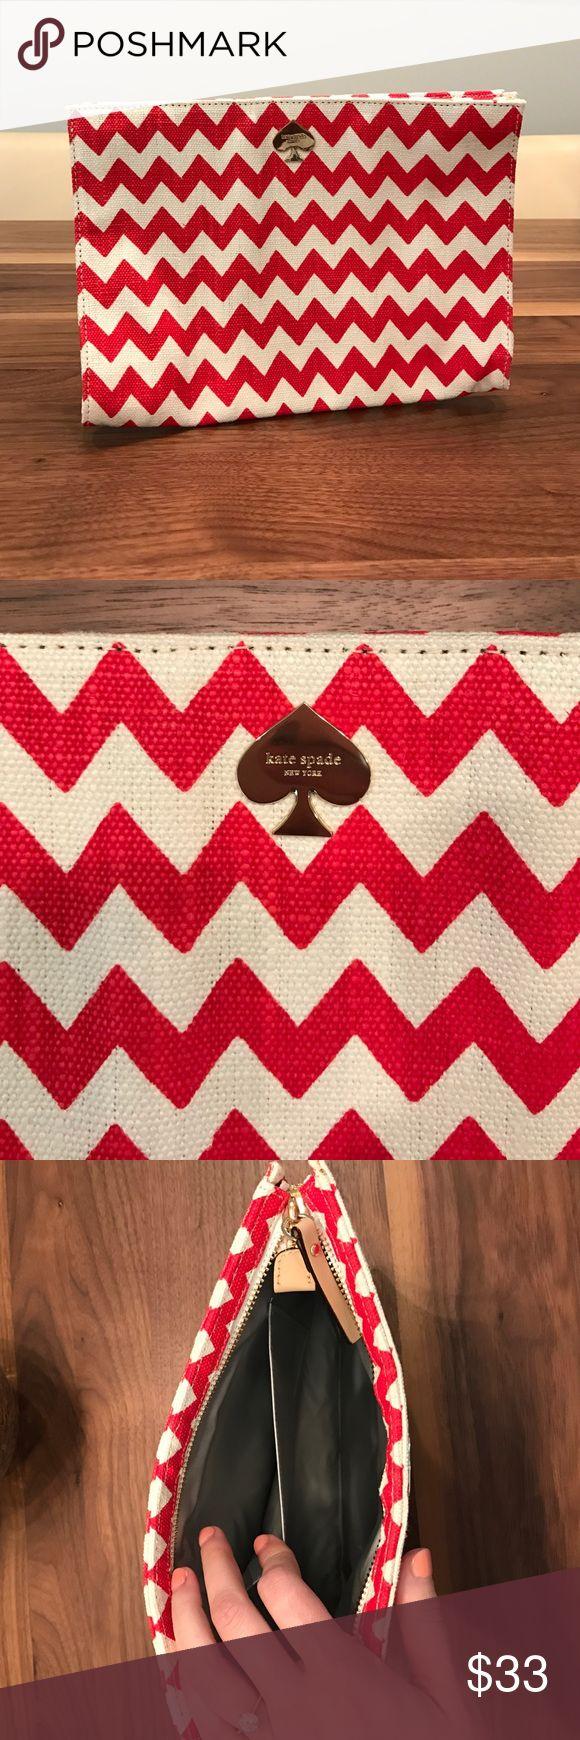 Kate Spade chevron clutch purse Kate Spade clutch purse. Canvas and in chevron pattern. Super cute and light! kate spade Bags Clutches & Wristlets